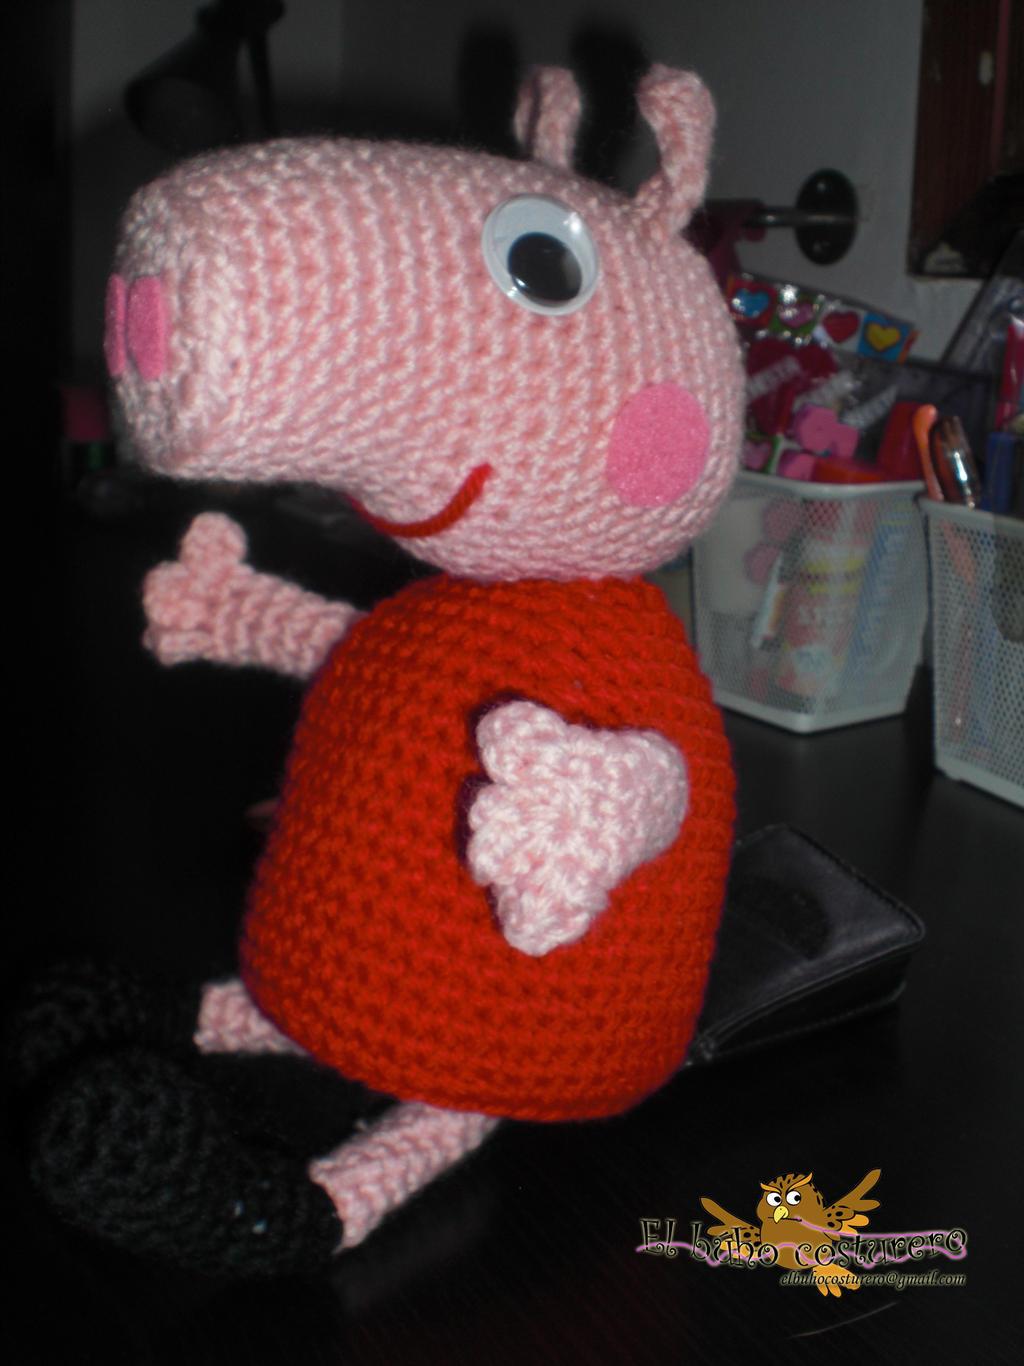 Free Amigurumi Patterns Star Wars : Peppa pig amigurumi by elbuhocosturero on DeviantArt